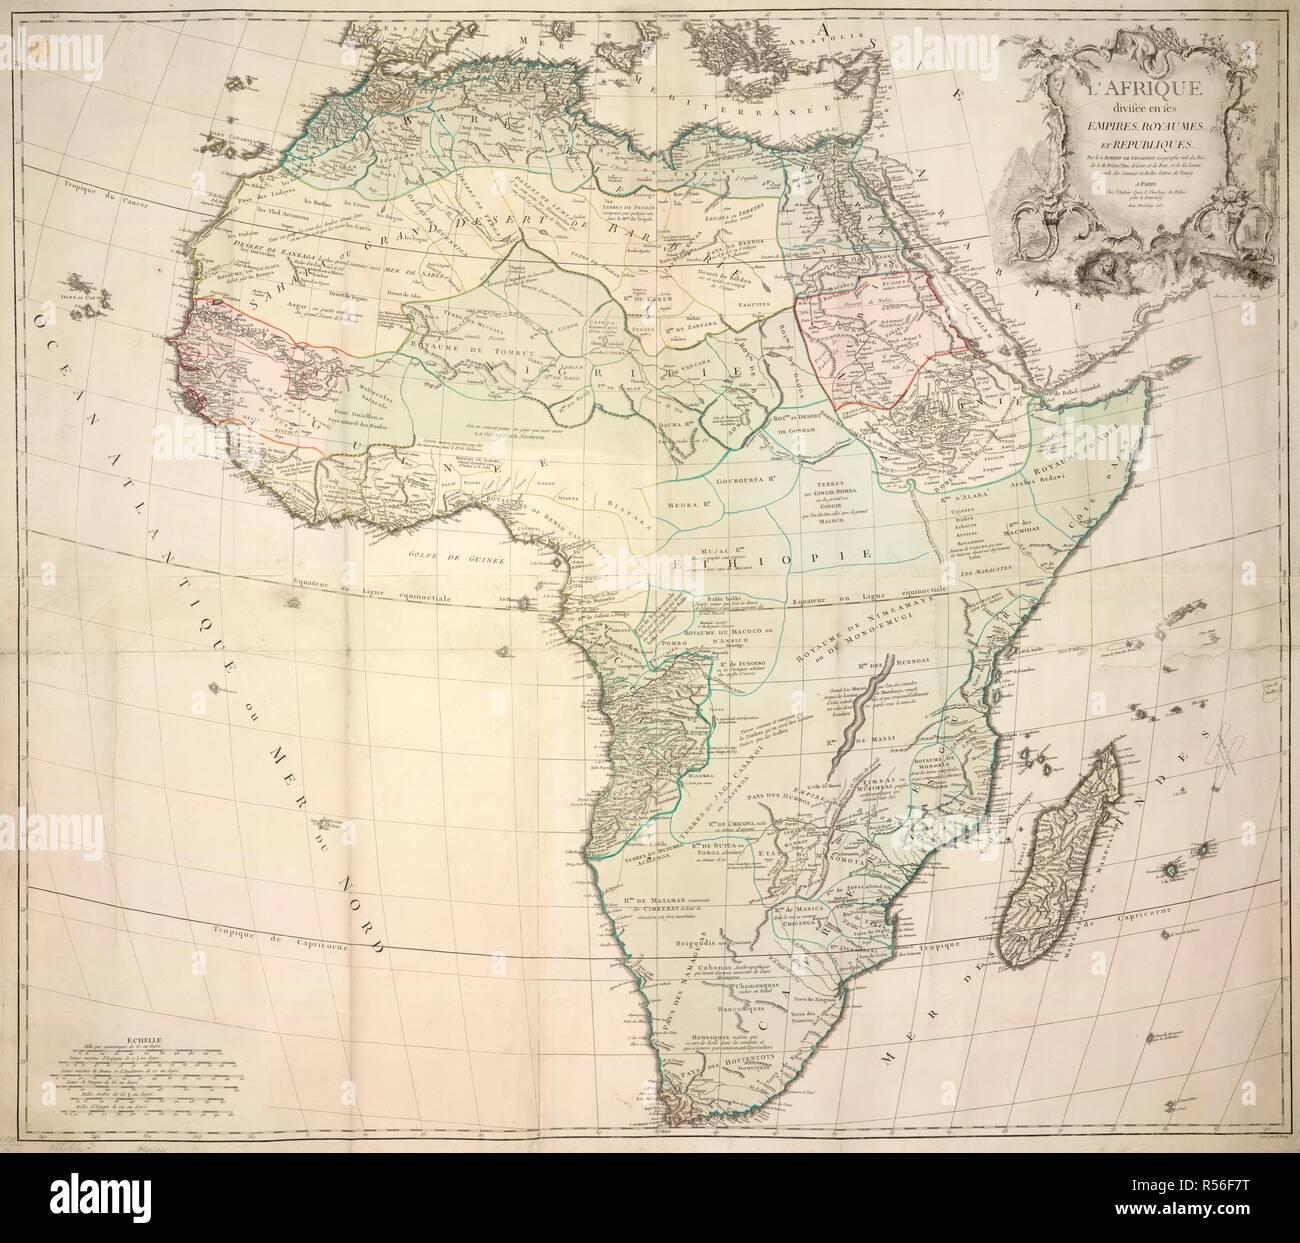 A map of Africa divided into its empires, kingdoms and republics. L'Afrique, divisée en ses Empires, Royaumes, et Republiques. 1767. Source: Maps K.Top.117.20.2 TAB. Language: French. - Stock Image